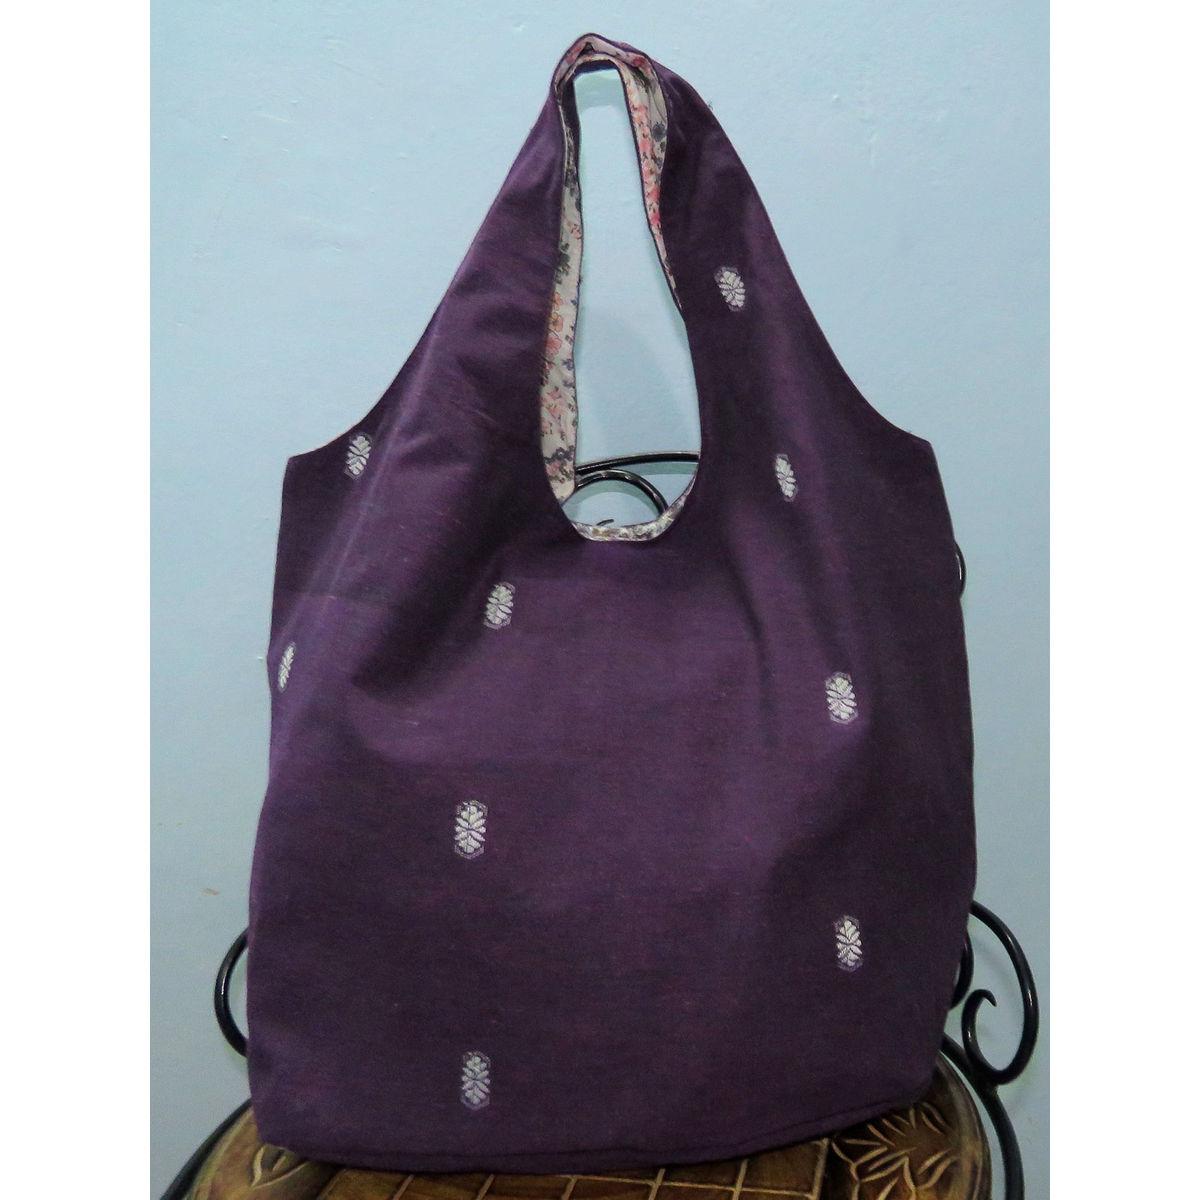 Purple handwoven Hobo cotton bag